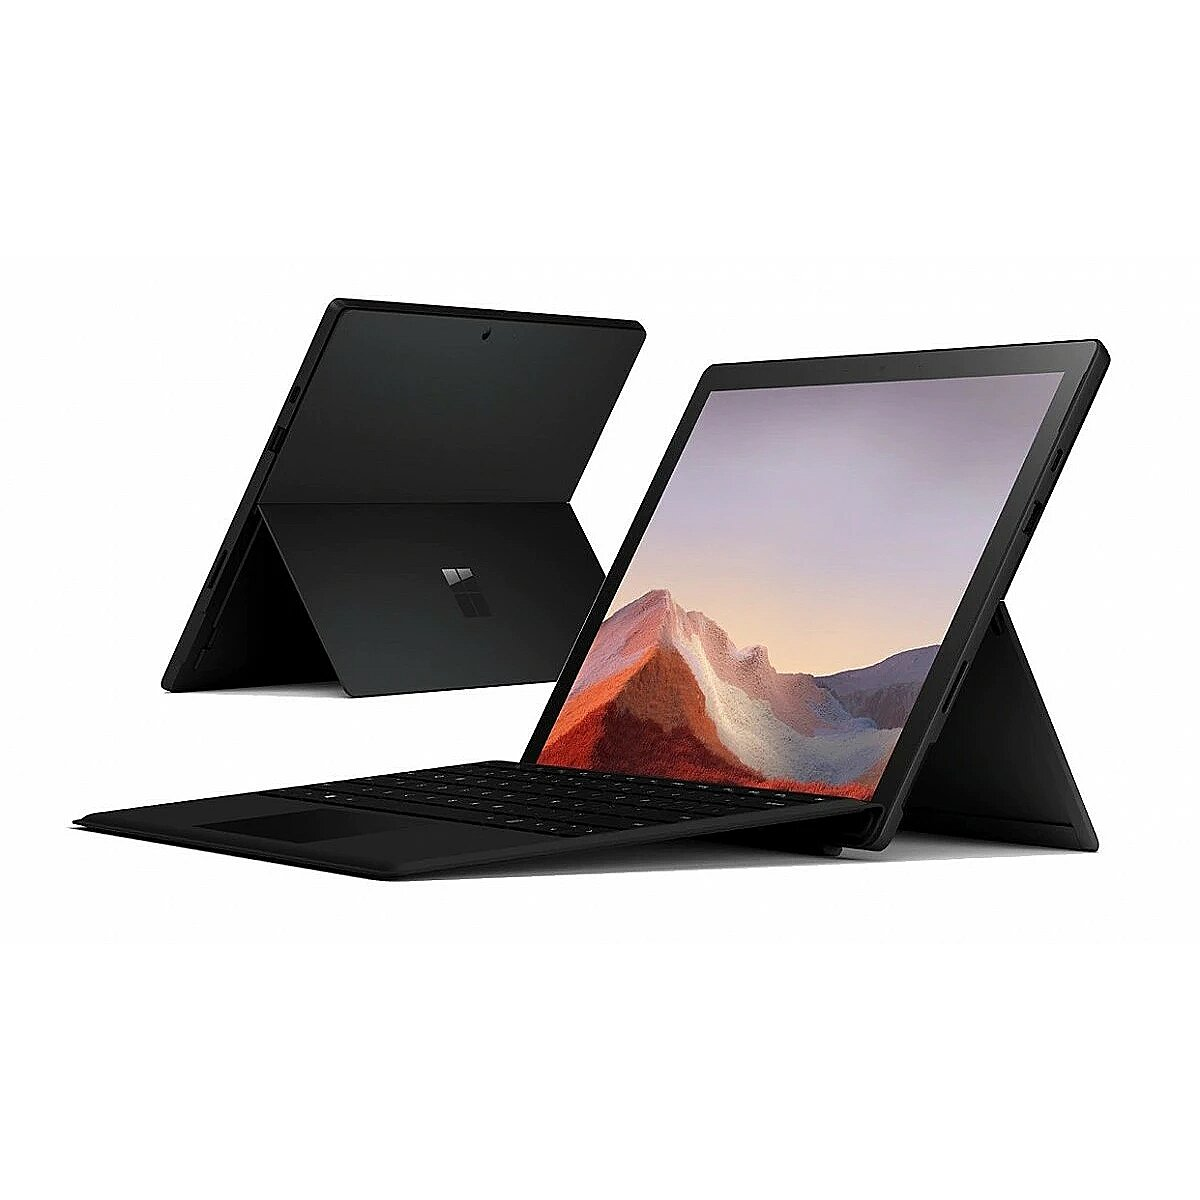 Microsoft Surface Pro 7 Black 512GB/i7-1065G7/16GB..